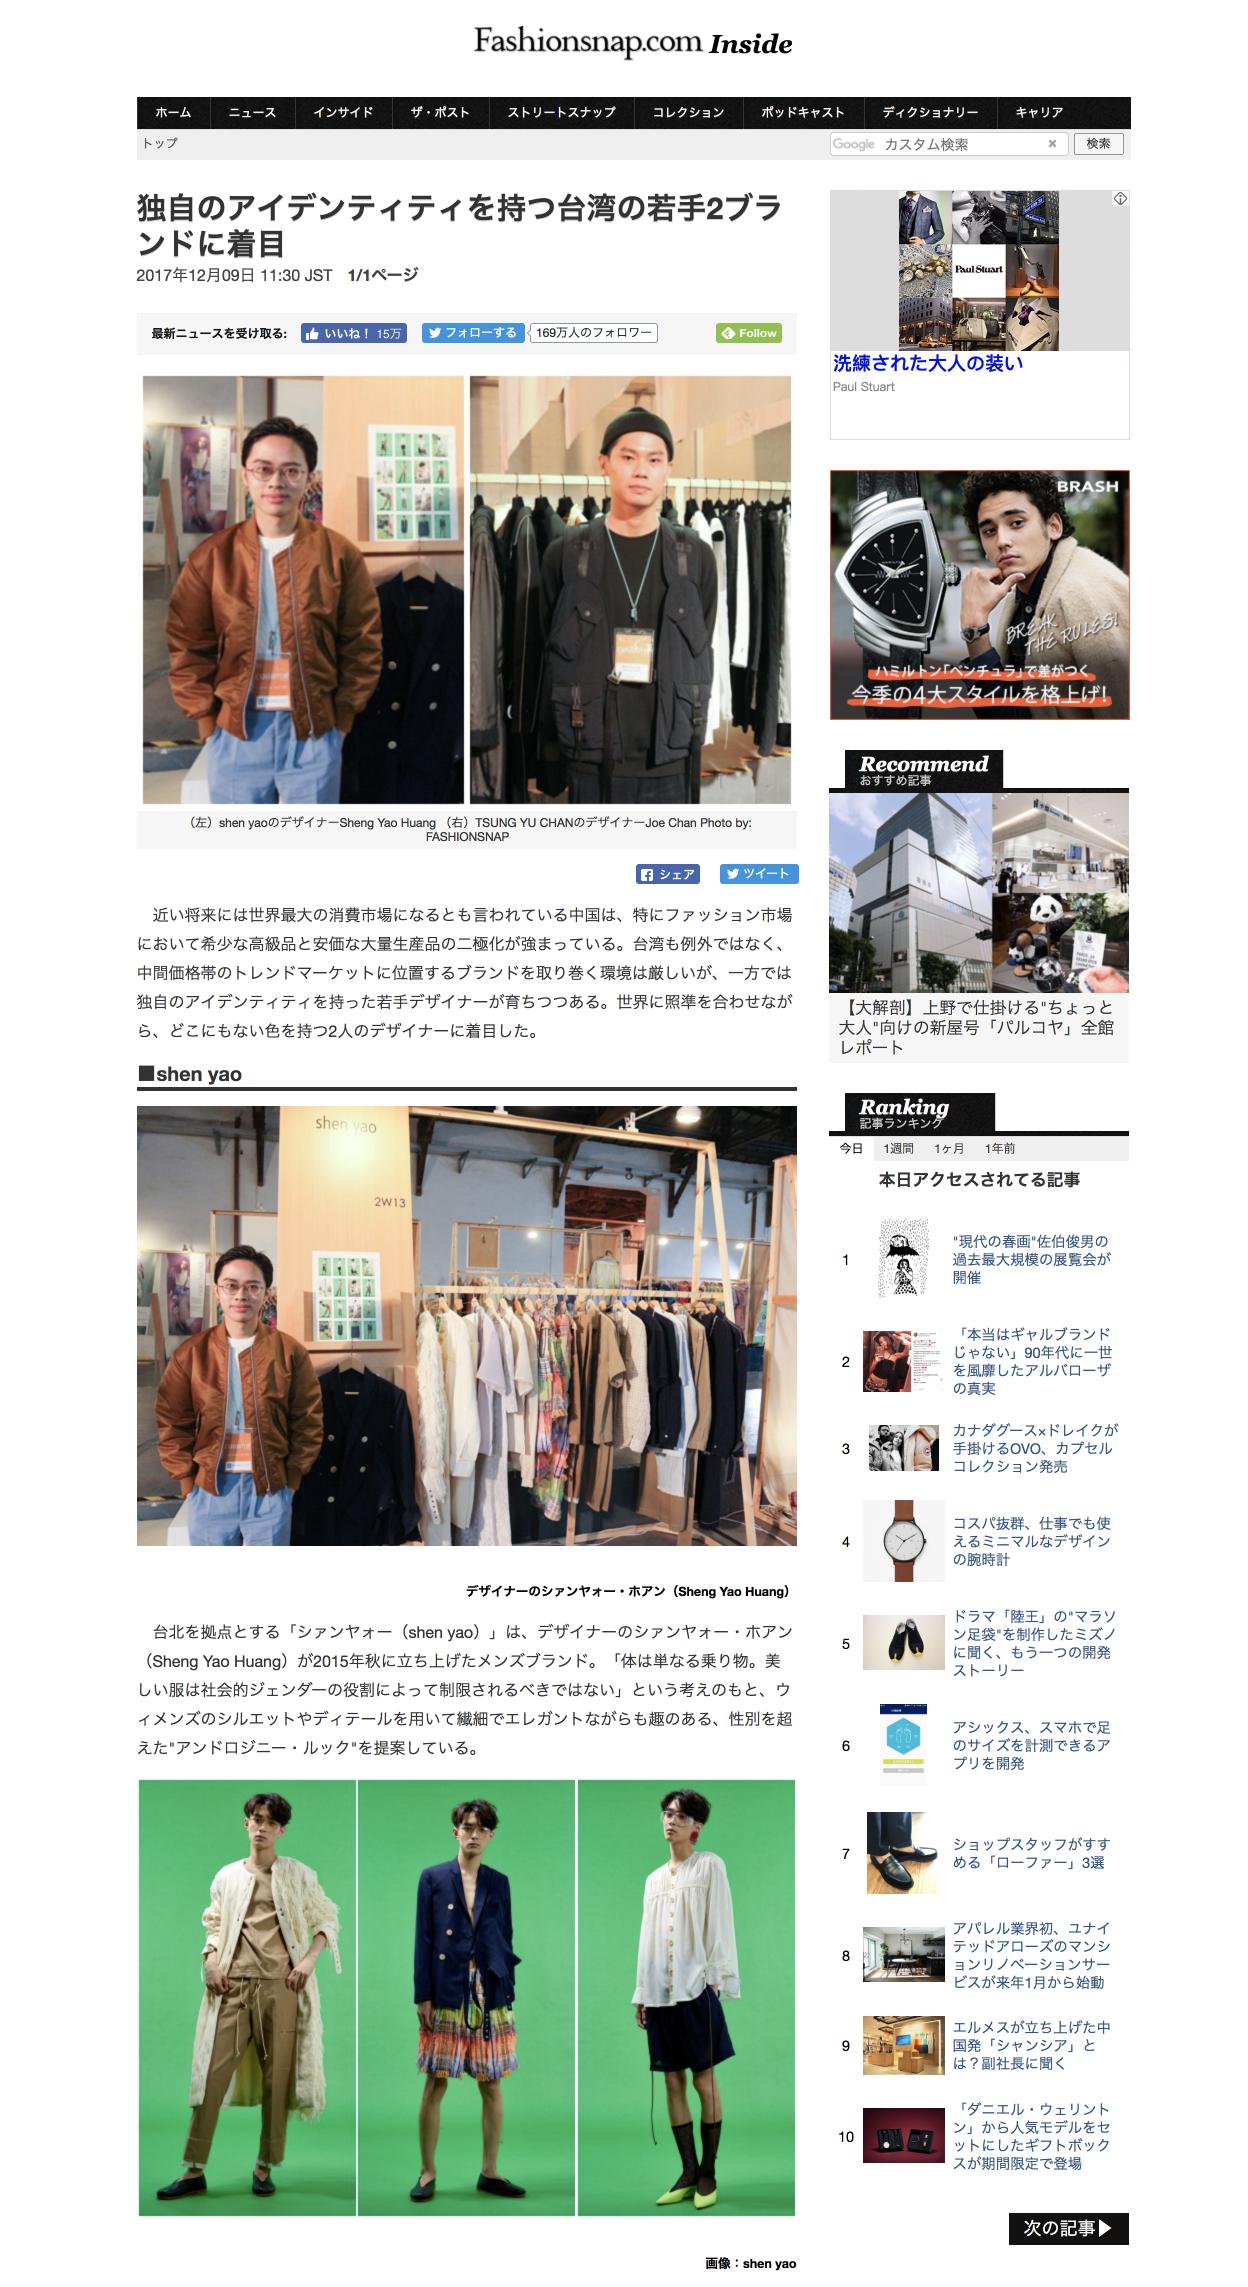 Fashionsnap Insider Featured